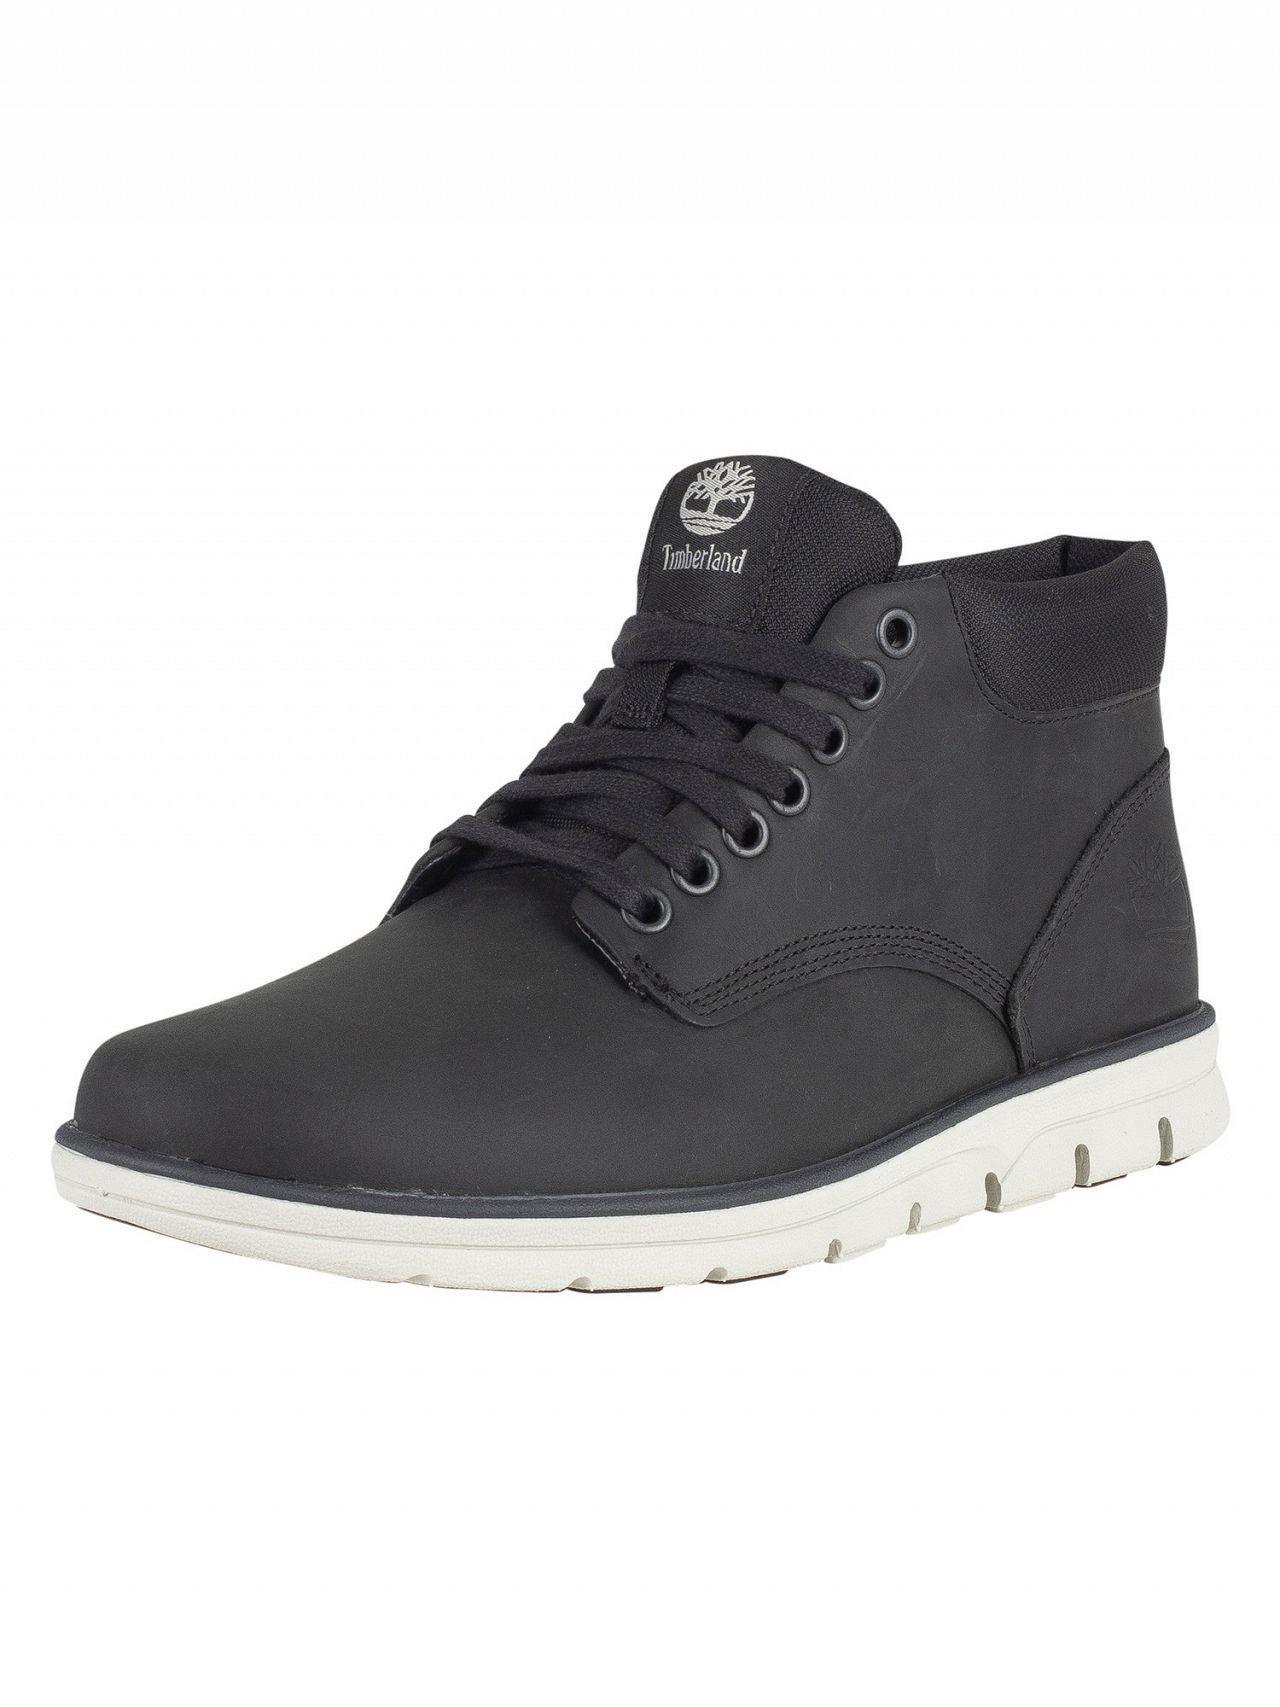 Lyst - Timberland Dark Grey Full Grain Bradstreet Chukka Leather ... ddebad283a4e